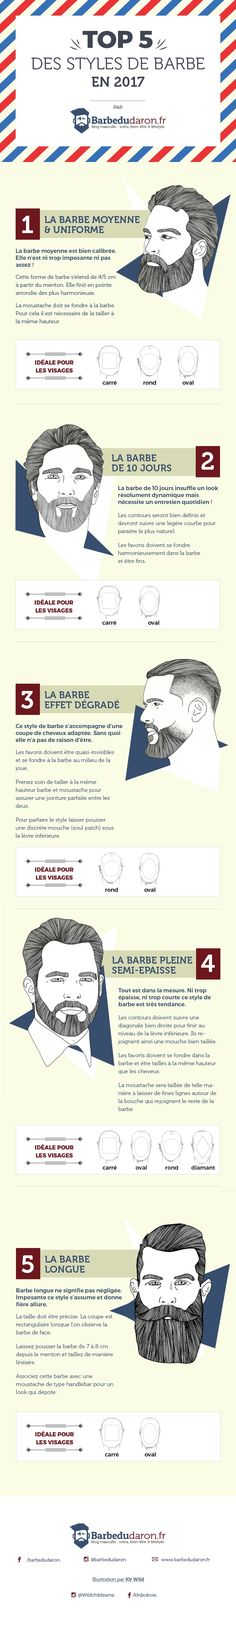 top 5 style barbe 2017 barbedudaron